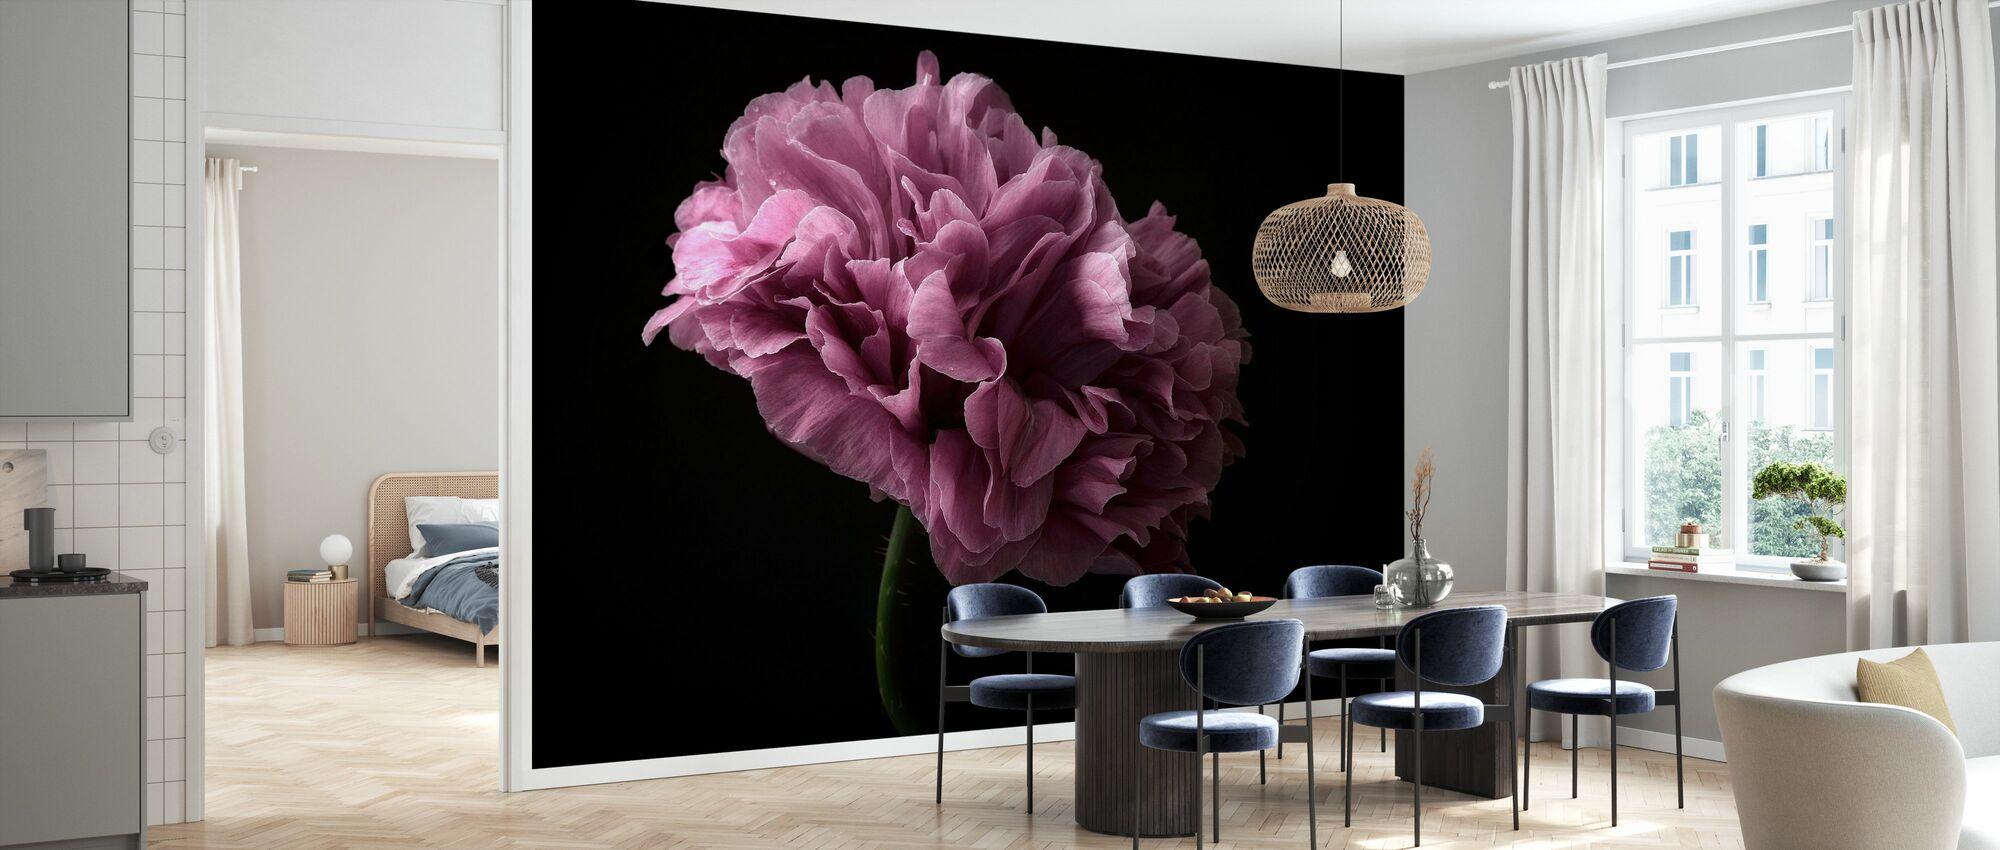 Poppy - Wallpaper - Kitchen